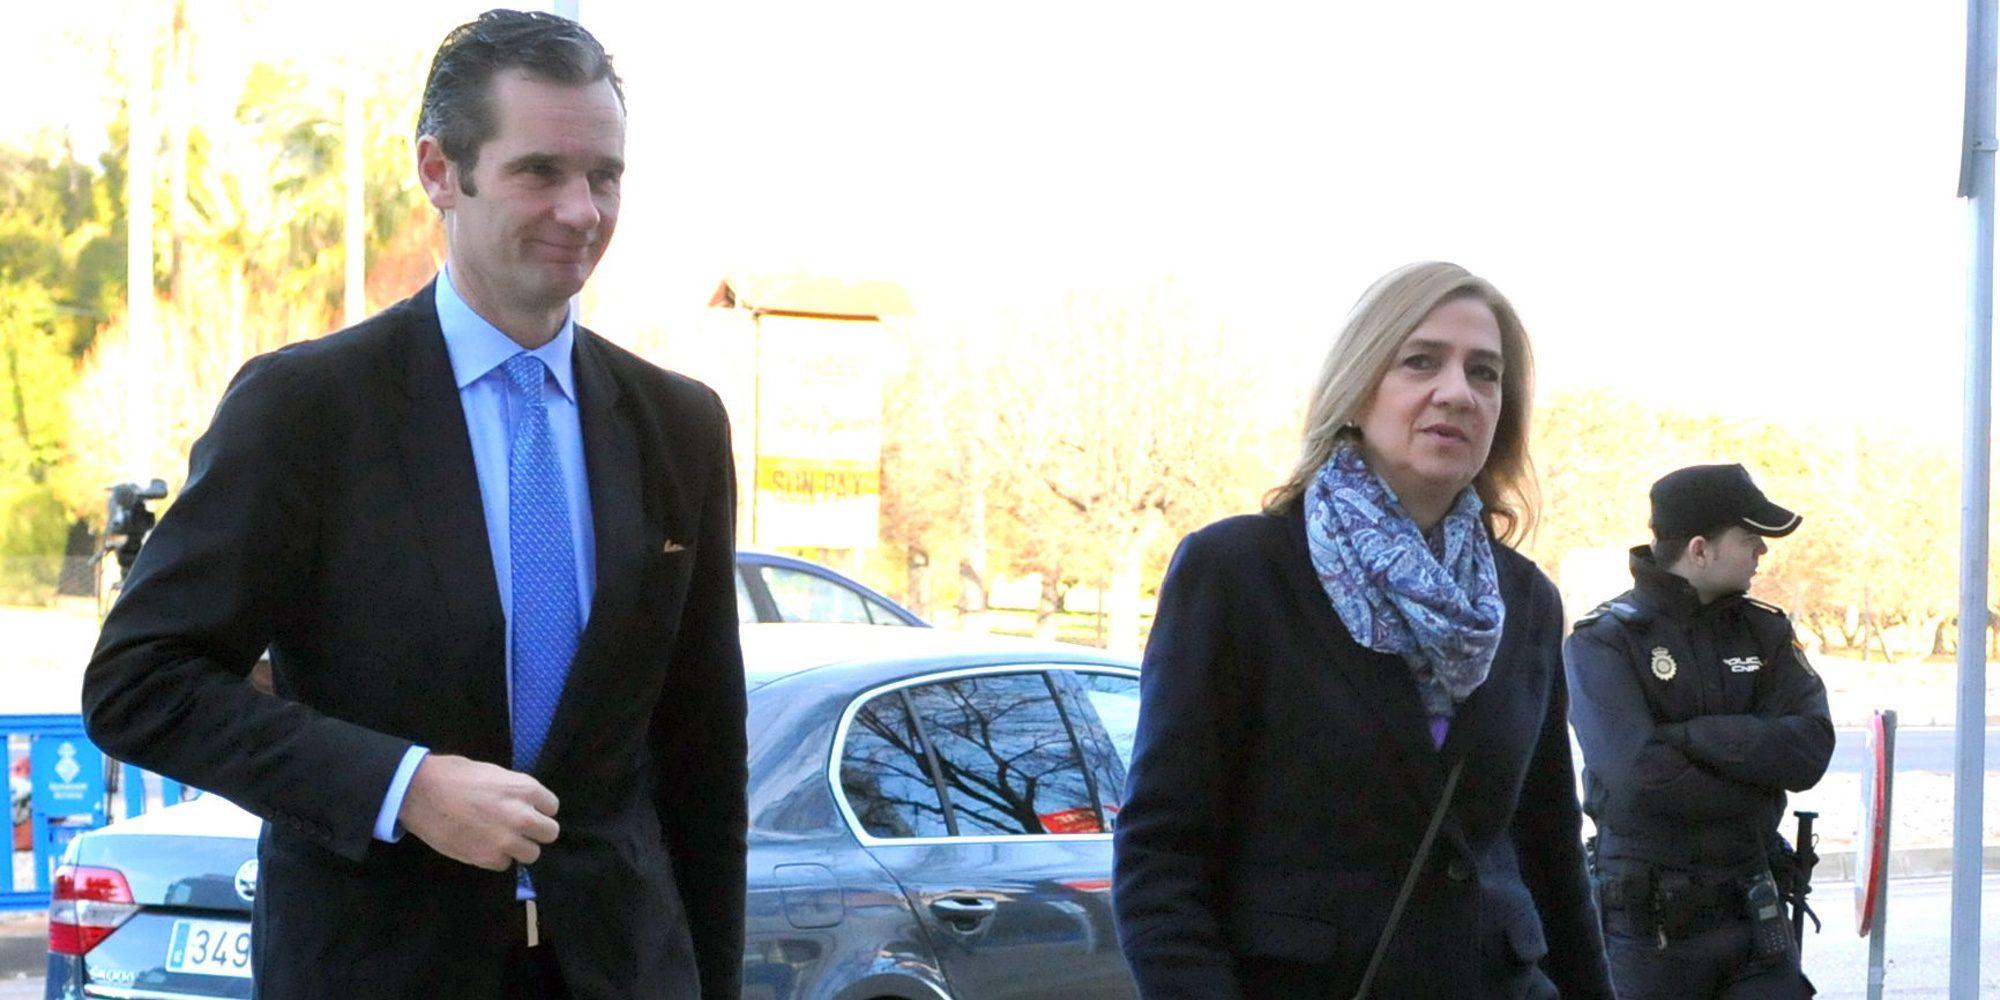 La Infanta Cristina e Iñaki Urdangarin volvieron a ser de la realeza por un día